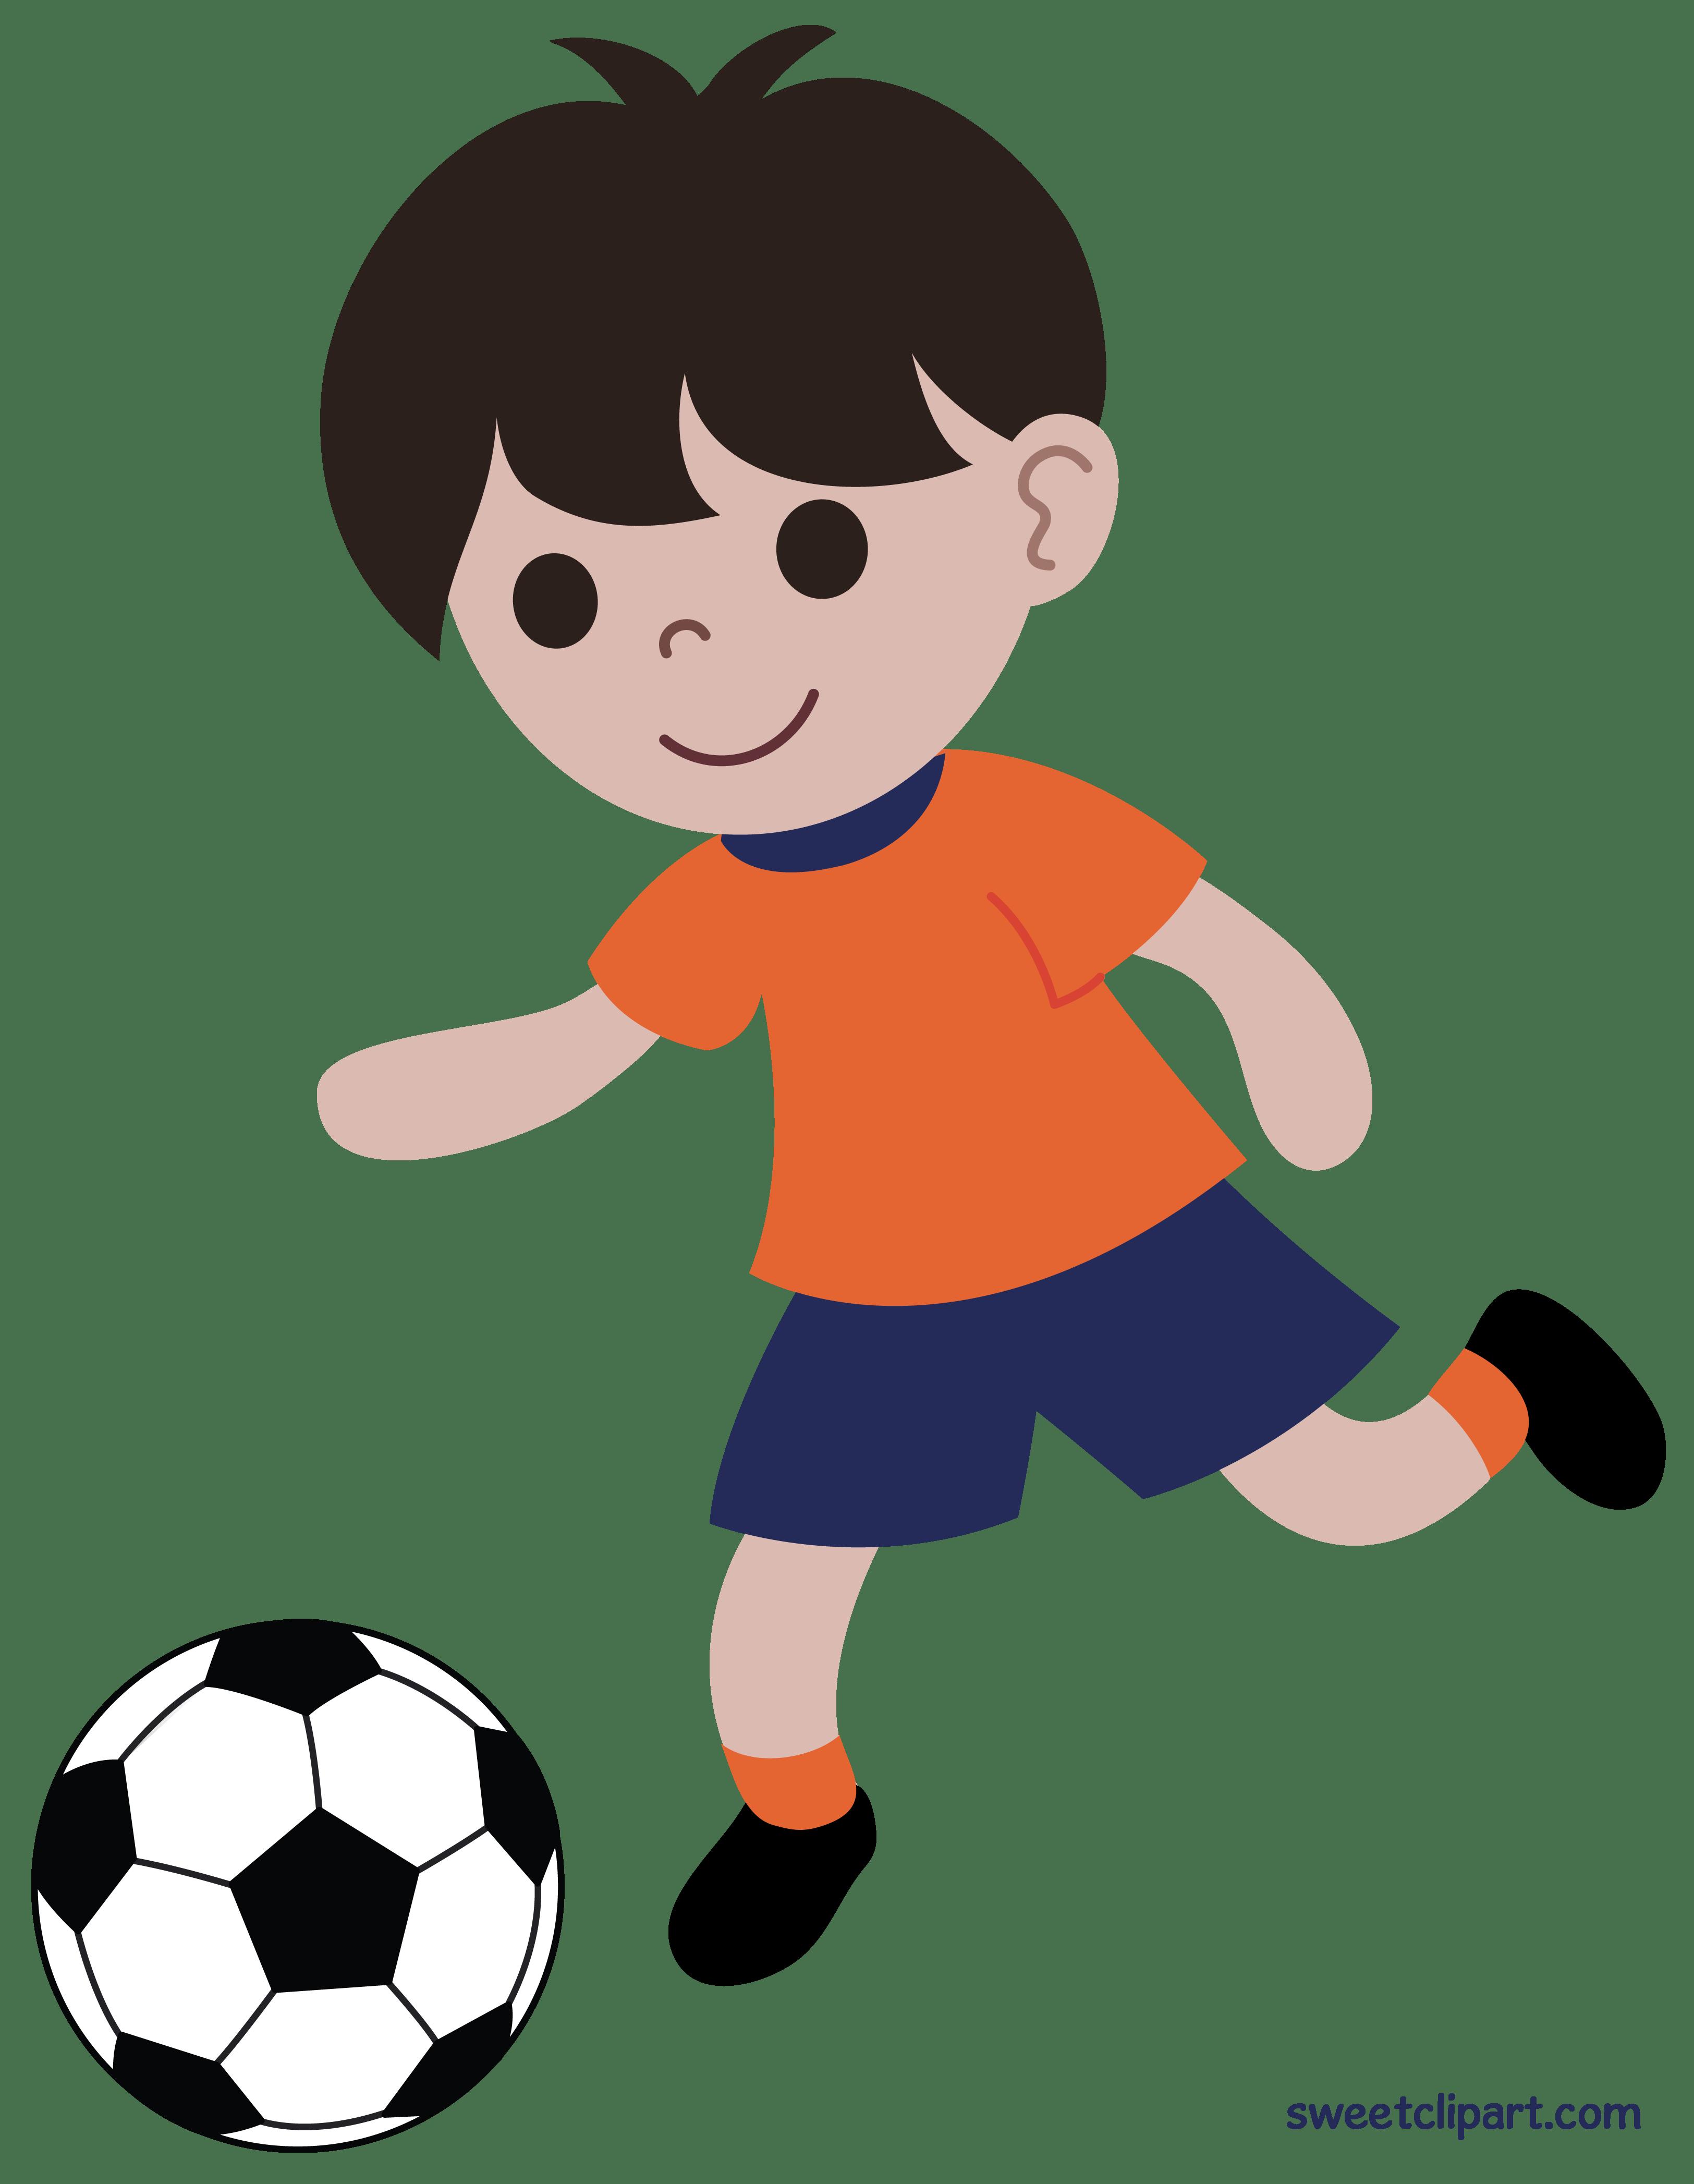 Boy soccer player clipart 2 » Clipart Portal.